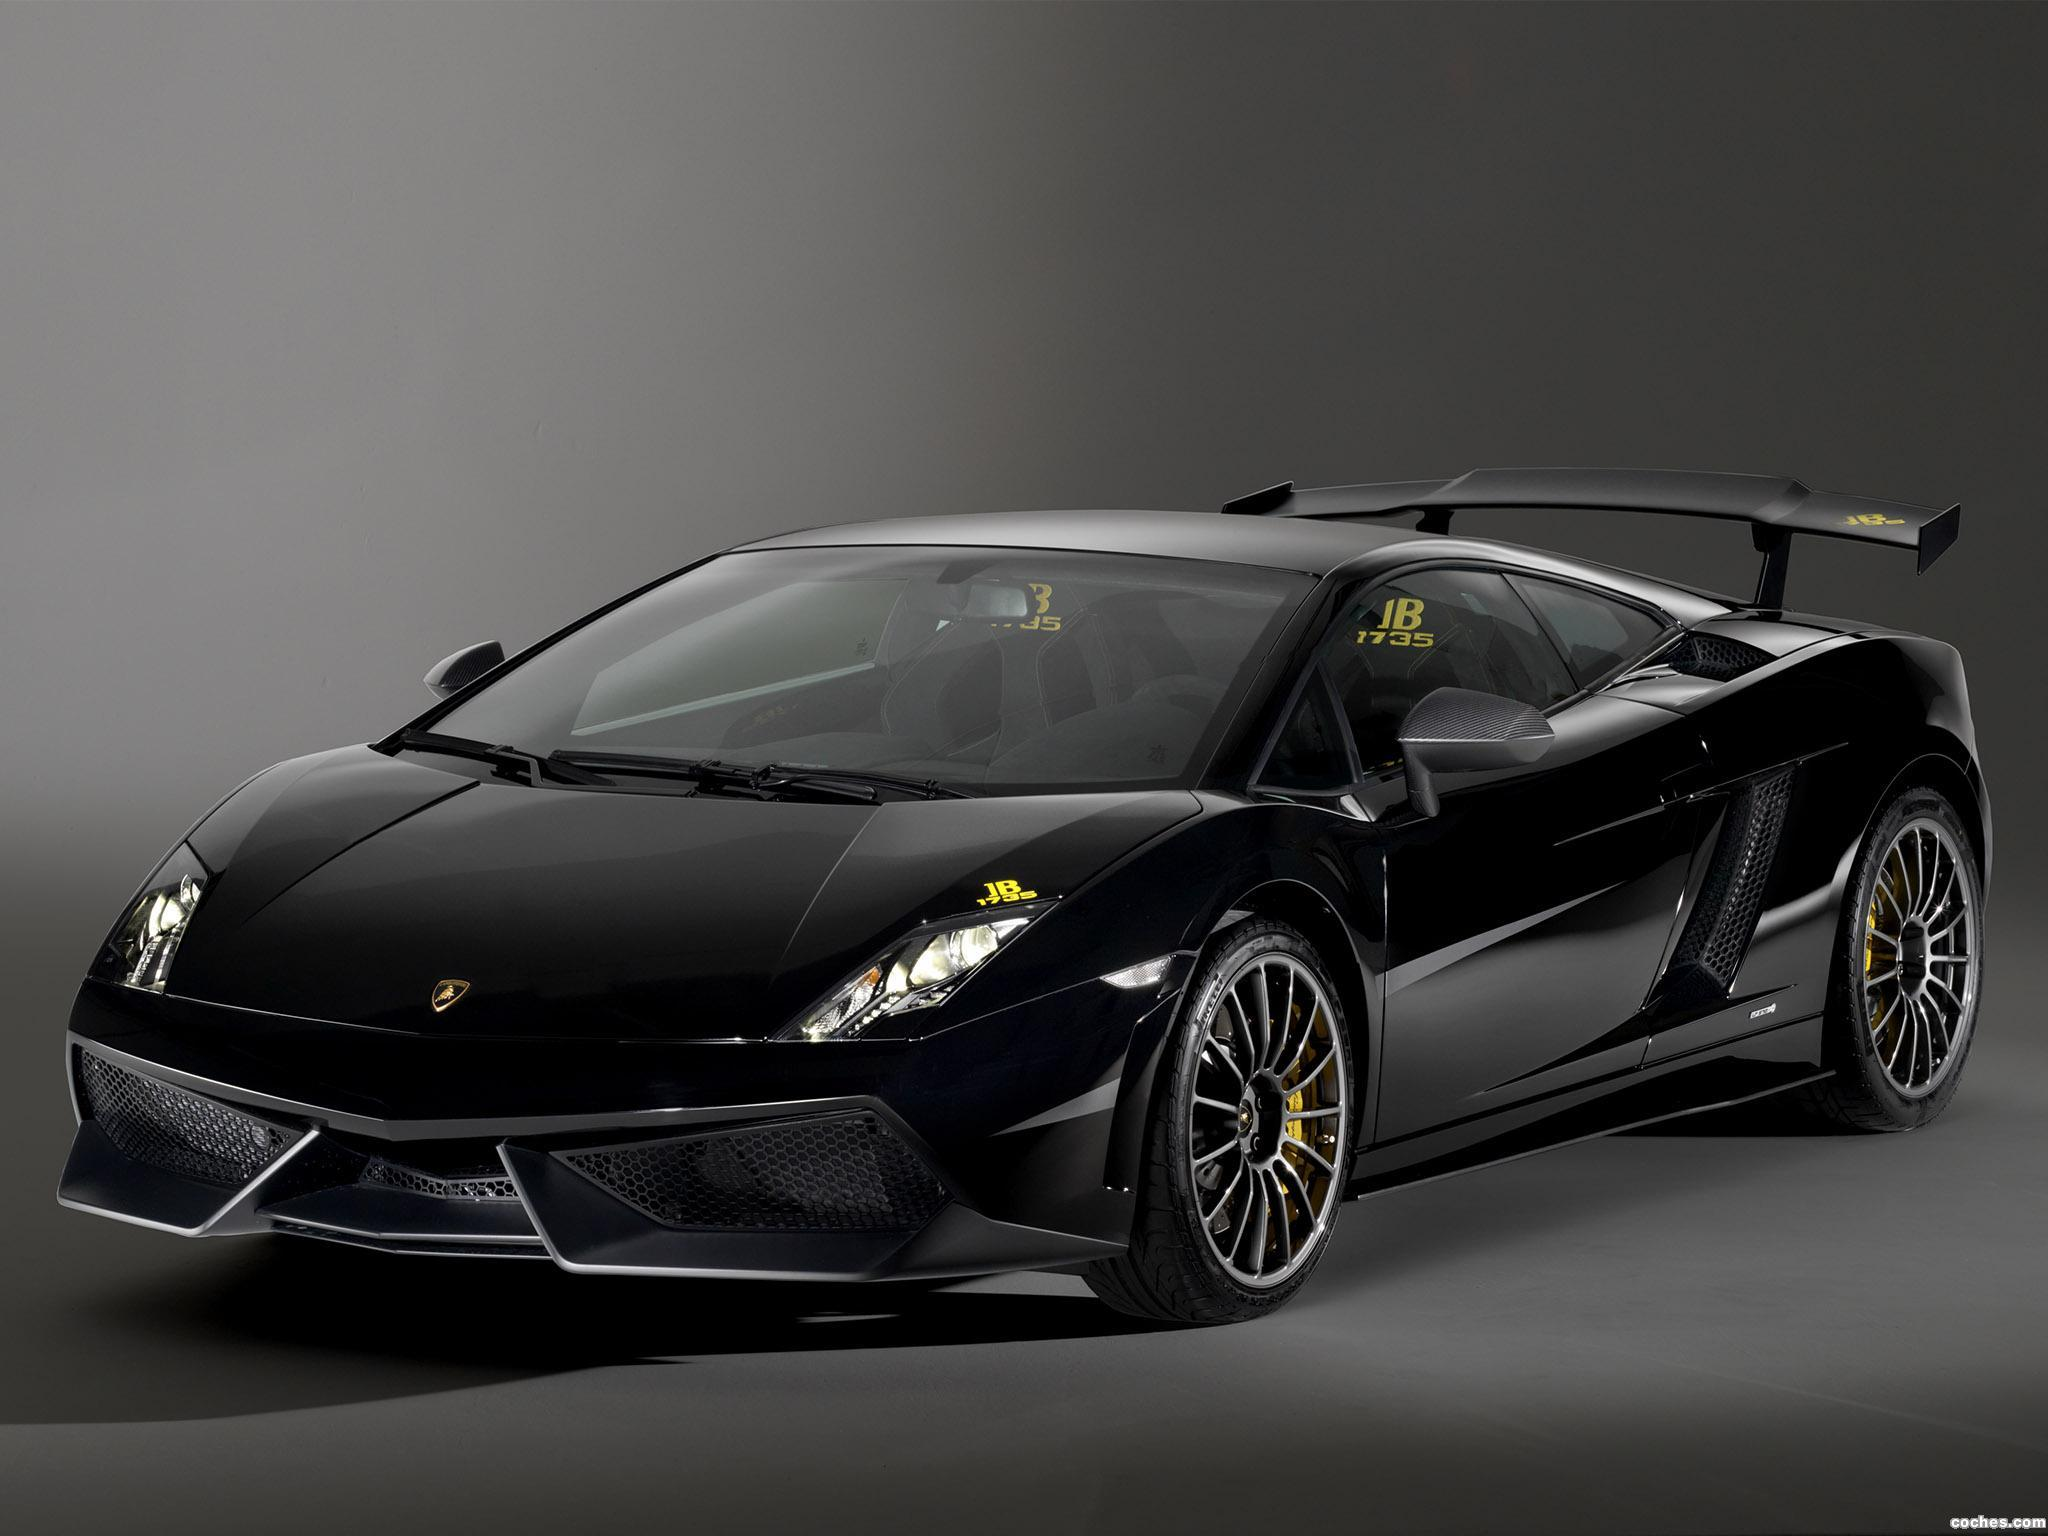 Foto 0 de Lamborghini Gallardo LP570-4 Blancpain Edition 2010